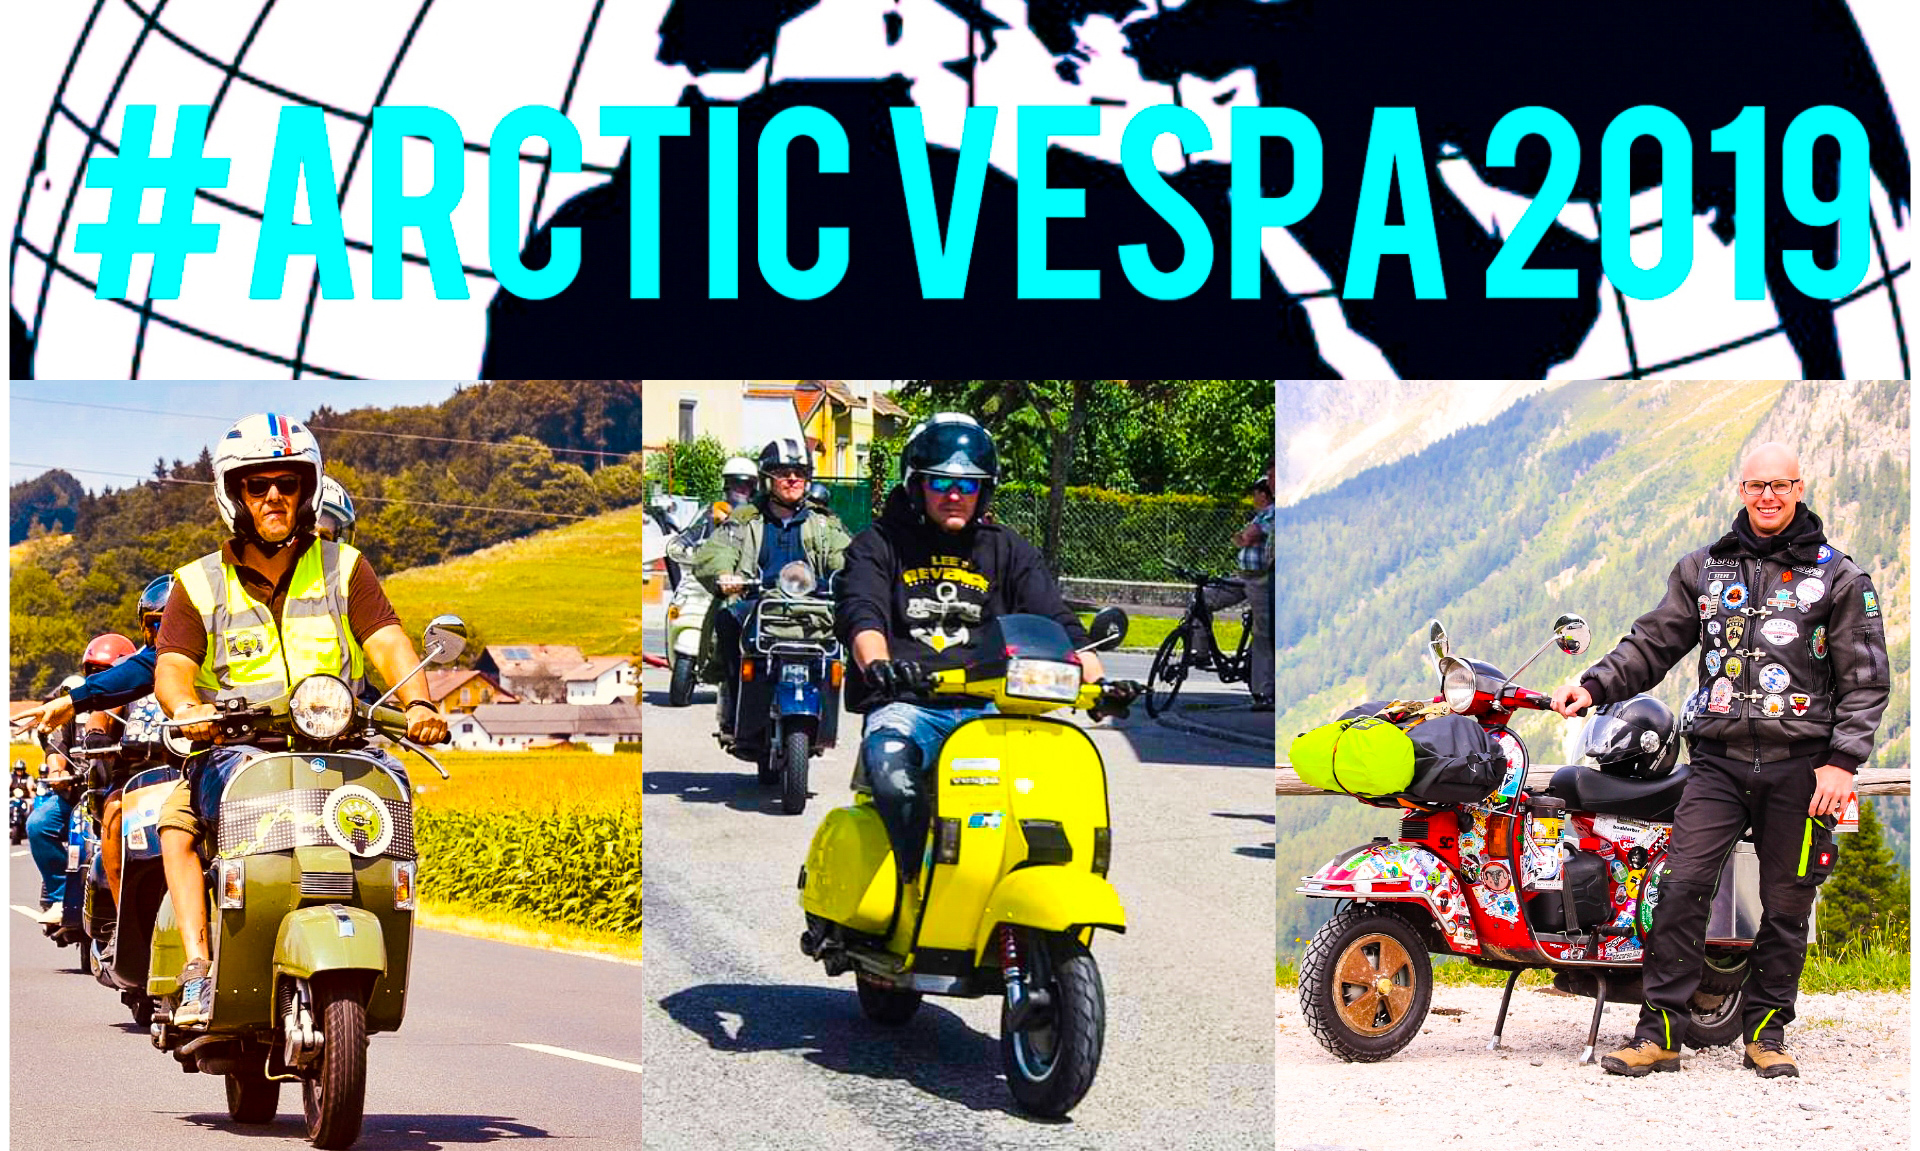 (c)#ArcticVespa